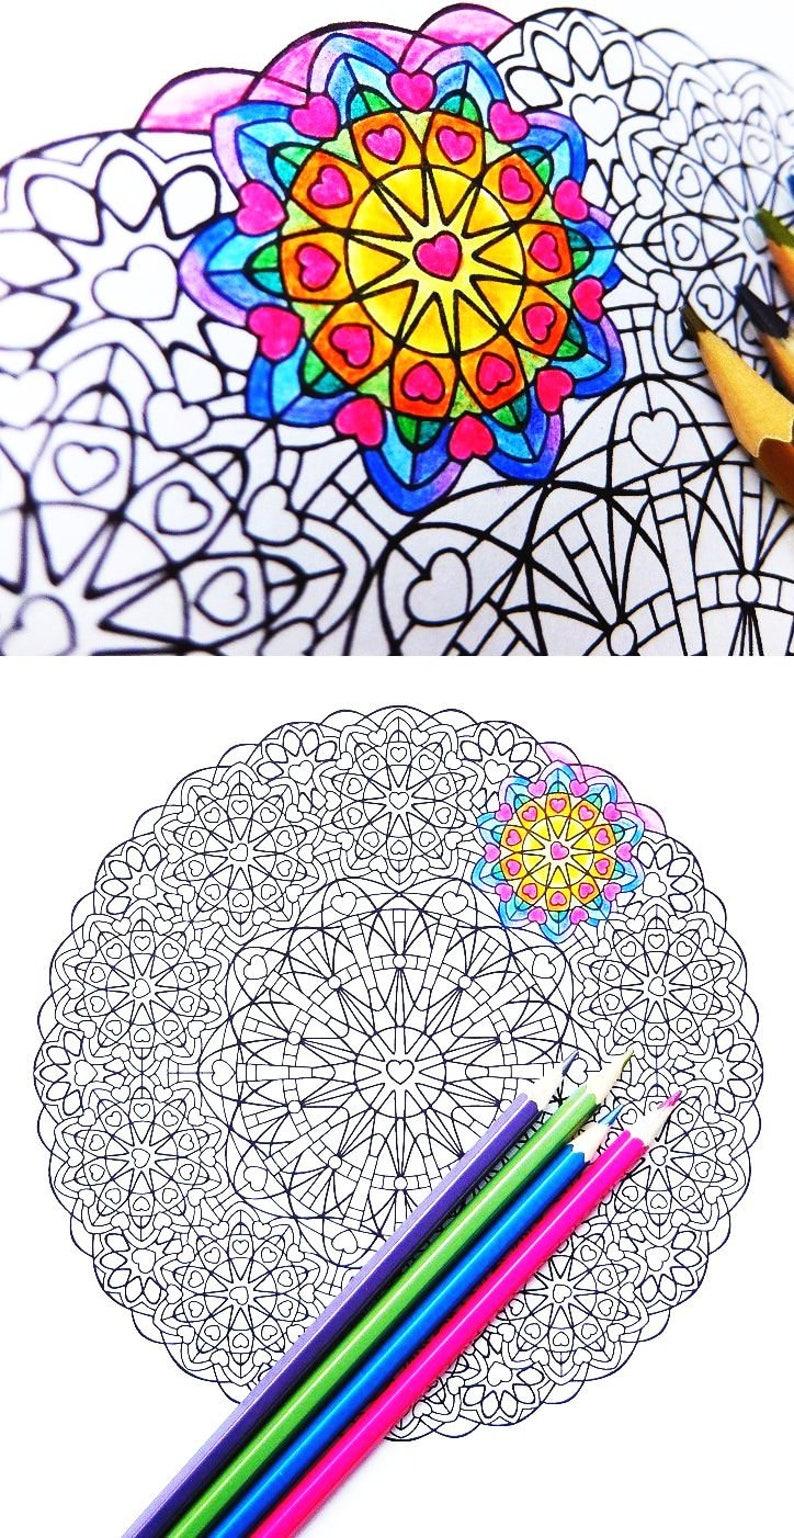 Coloriage De Mandala Damour A Imprimer.Mandala Coloriage Amour Bienveillant Metta Imprimer Etsy